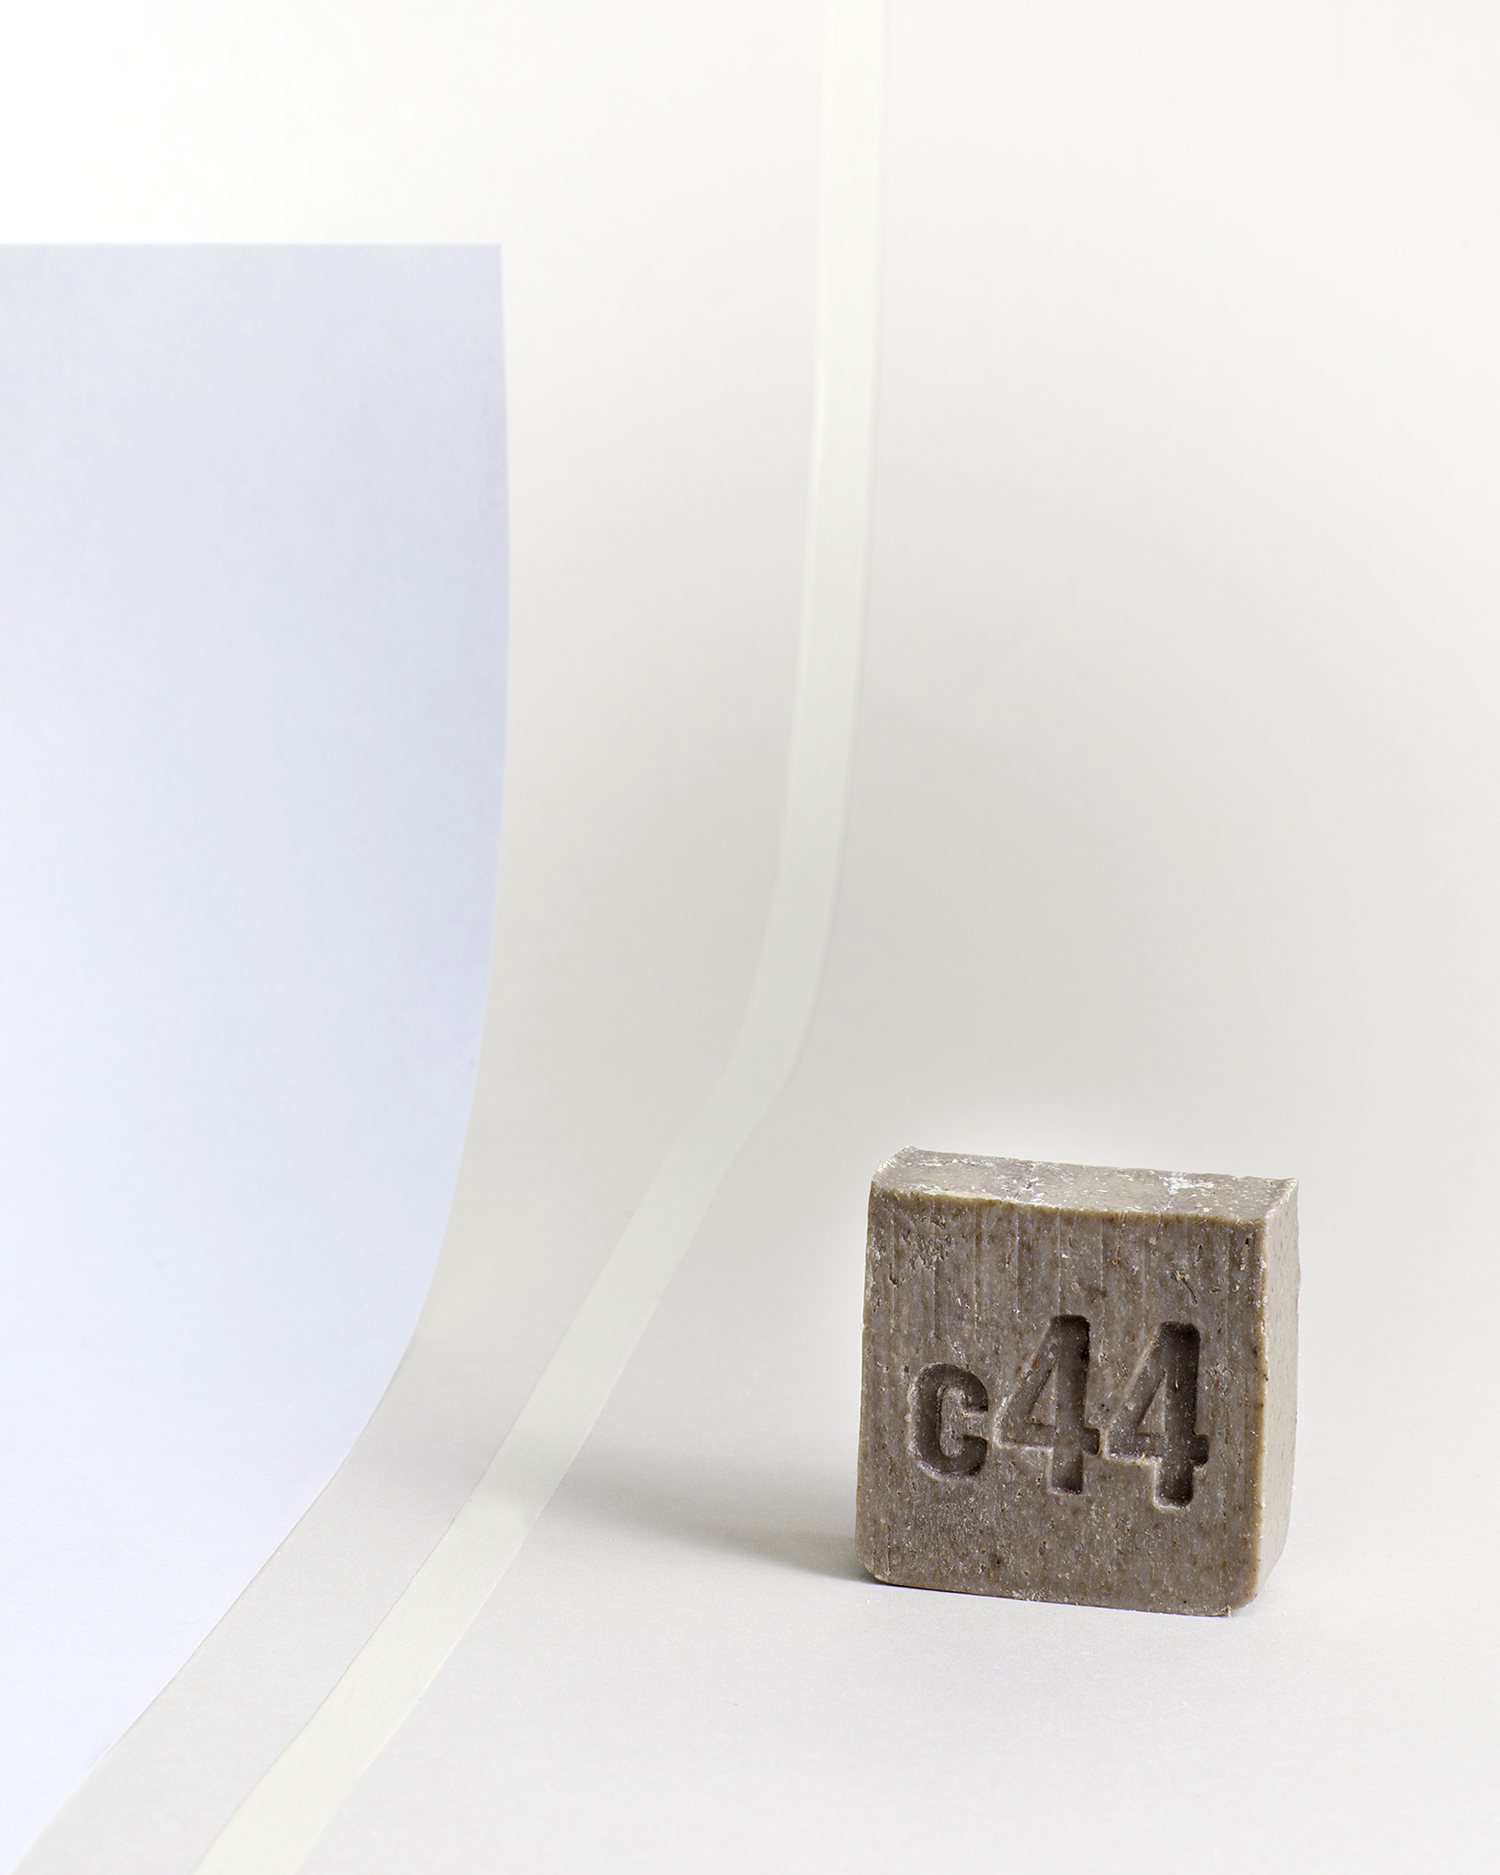 Carriage 44-105-4x5.jpg